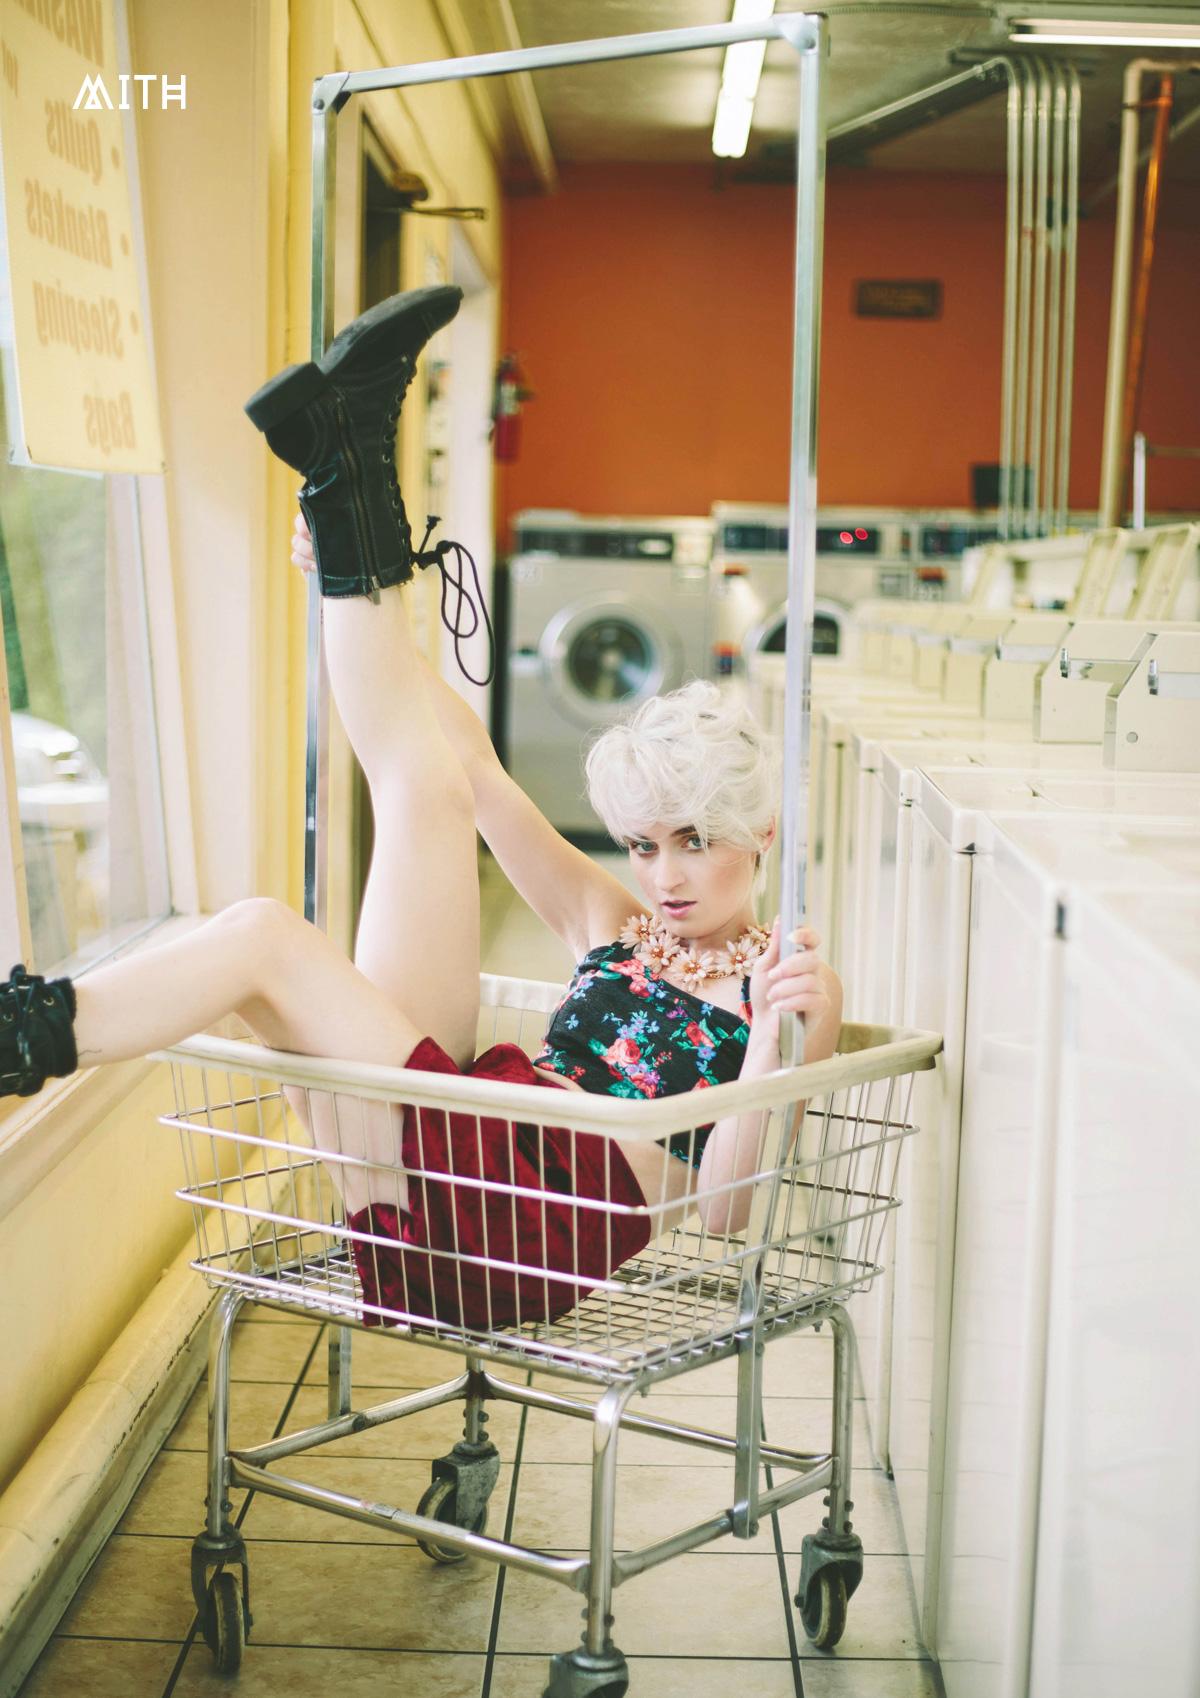 MITH_platinum-punk_christie-berube_morgan-nielson_web03